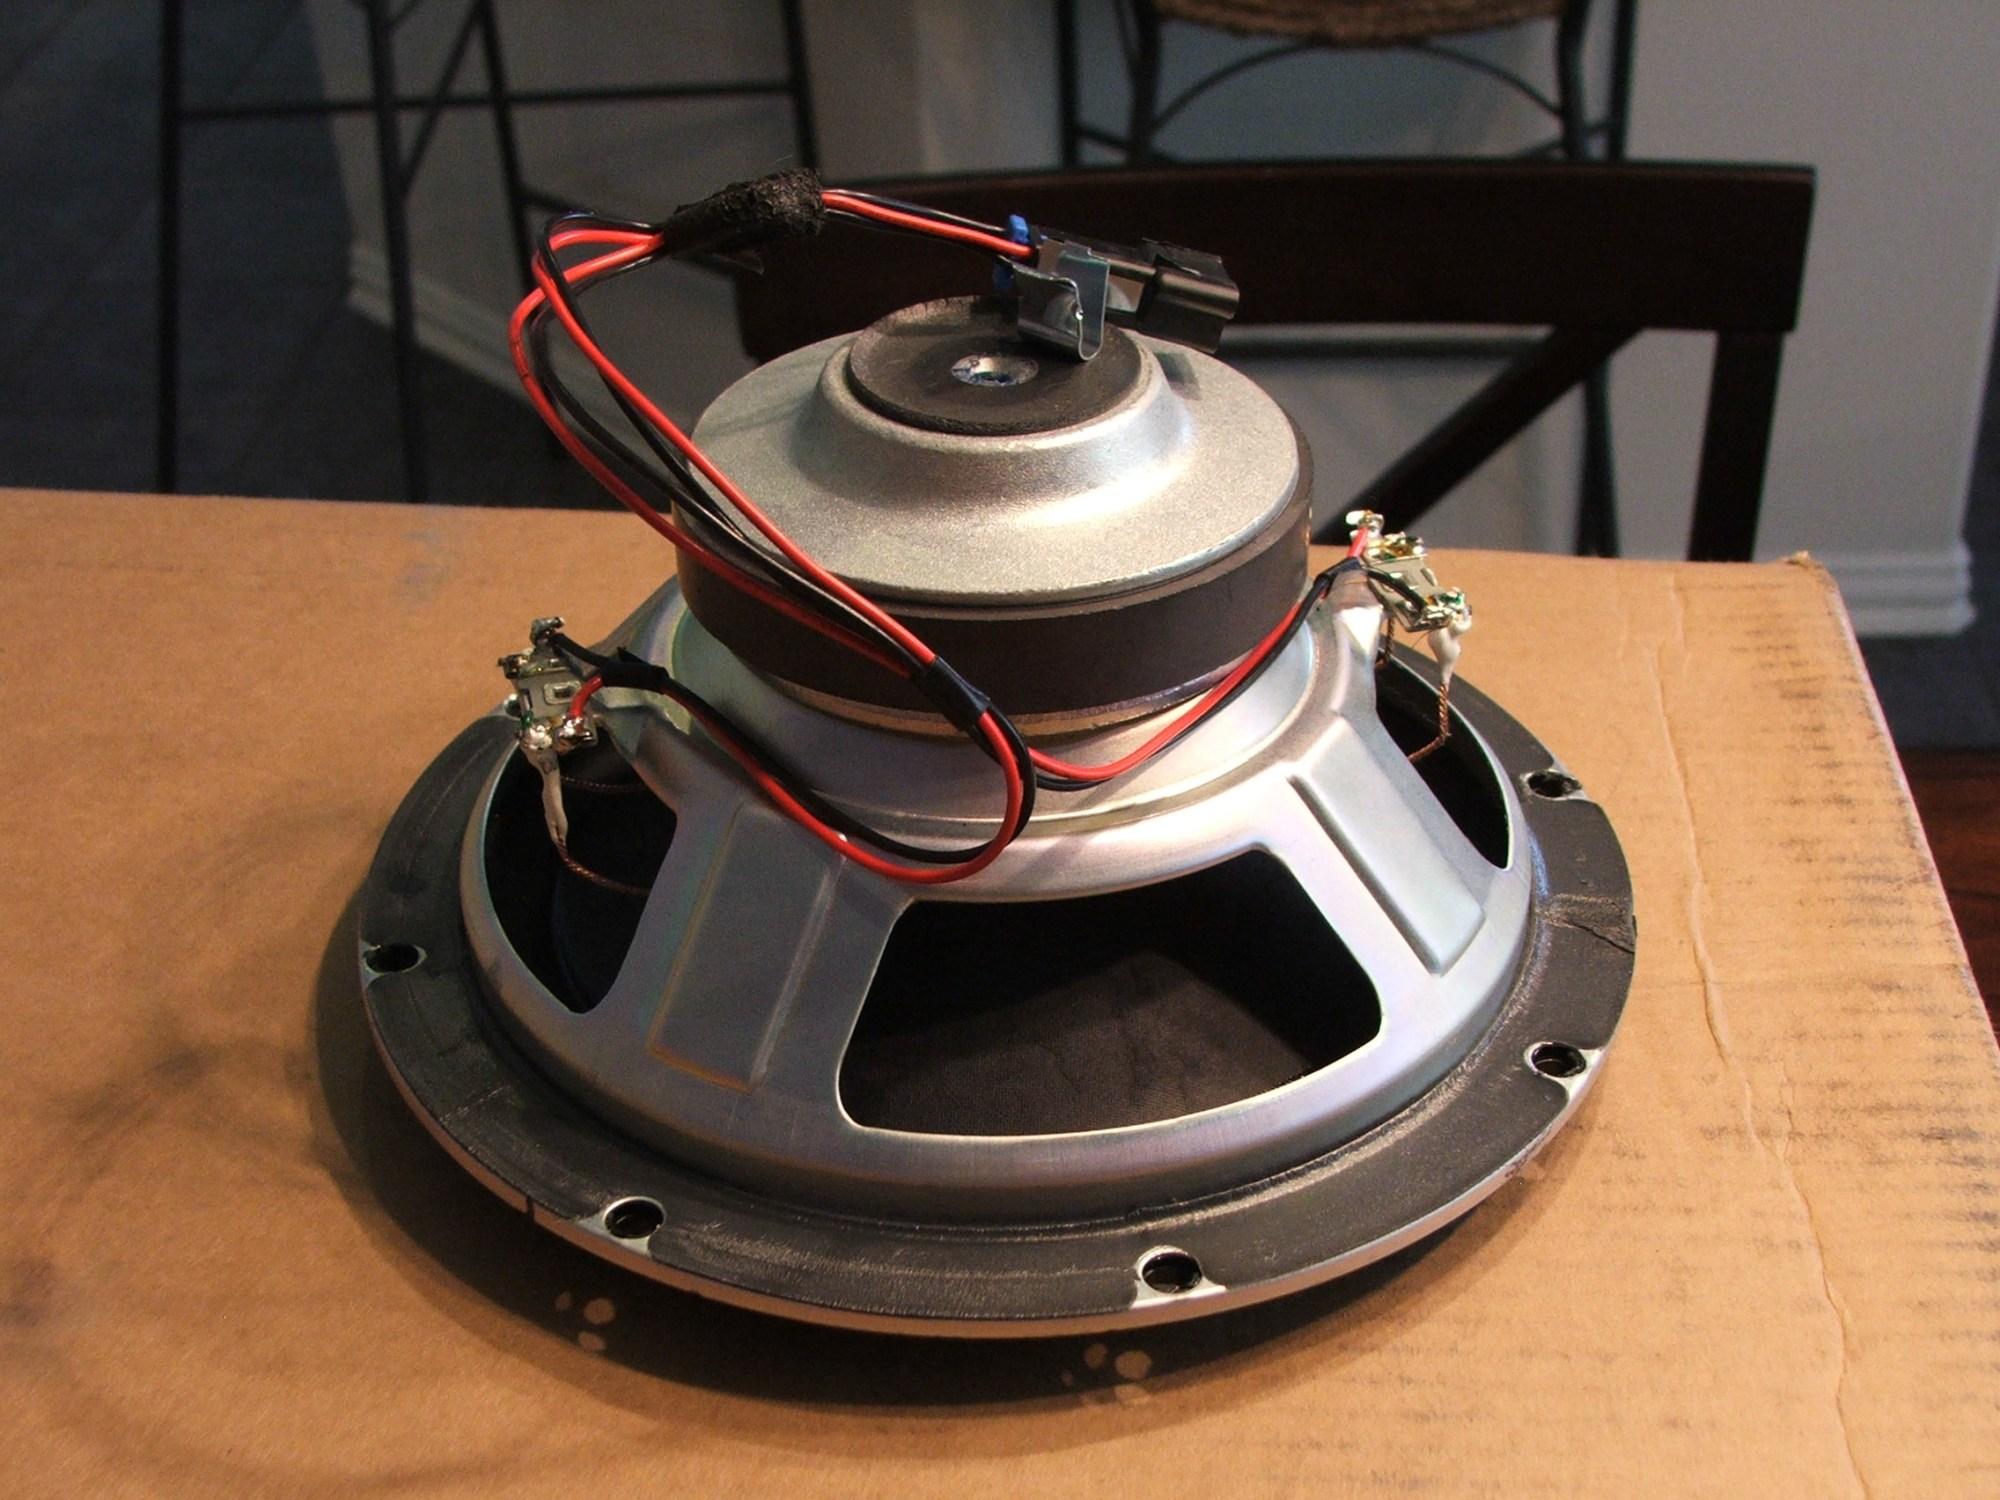 hight resolution of sub box wiring wiring diagram source 4 ohm subwoofer wiring sub box wiring